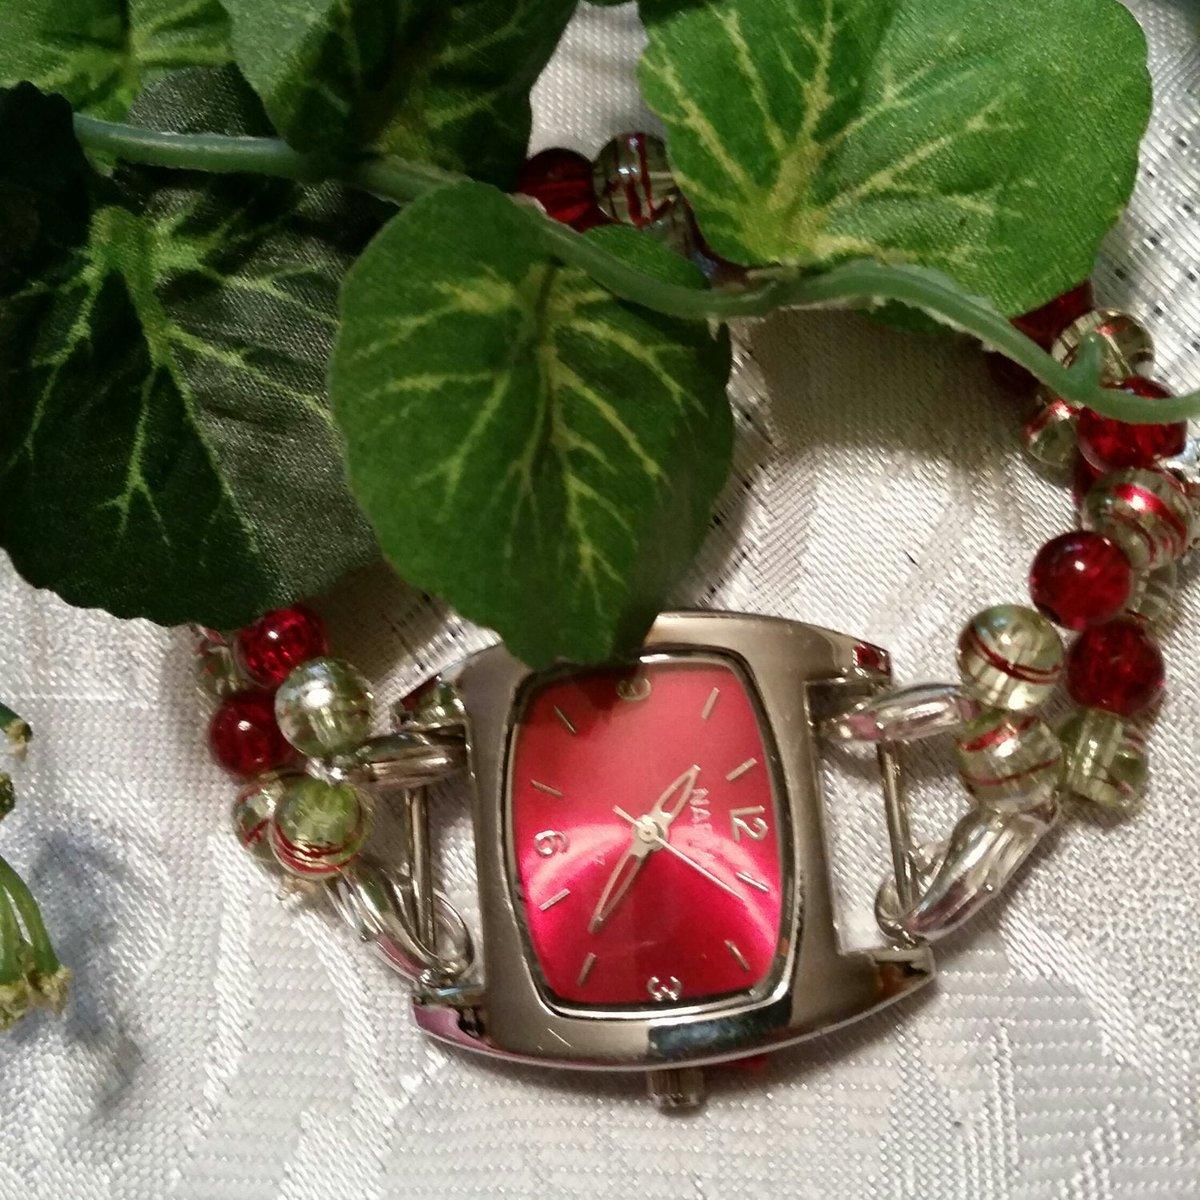 Little beaded chunky watch, red white and blue small beaded jewelry, handmade jewelry, handmade beaded band, stretchy band #mjjewelryadventures #chunkybeadedwatch #redwhiteandble #patrioticbeads #stretchybeadedband #giftidea #shopEtsy #shopsmallbusiness  https://etsy.me/2V1jAyupic.twitter.com/scl8WDS4Ov